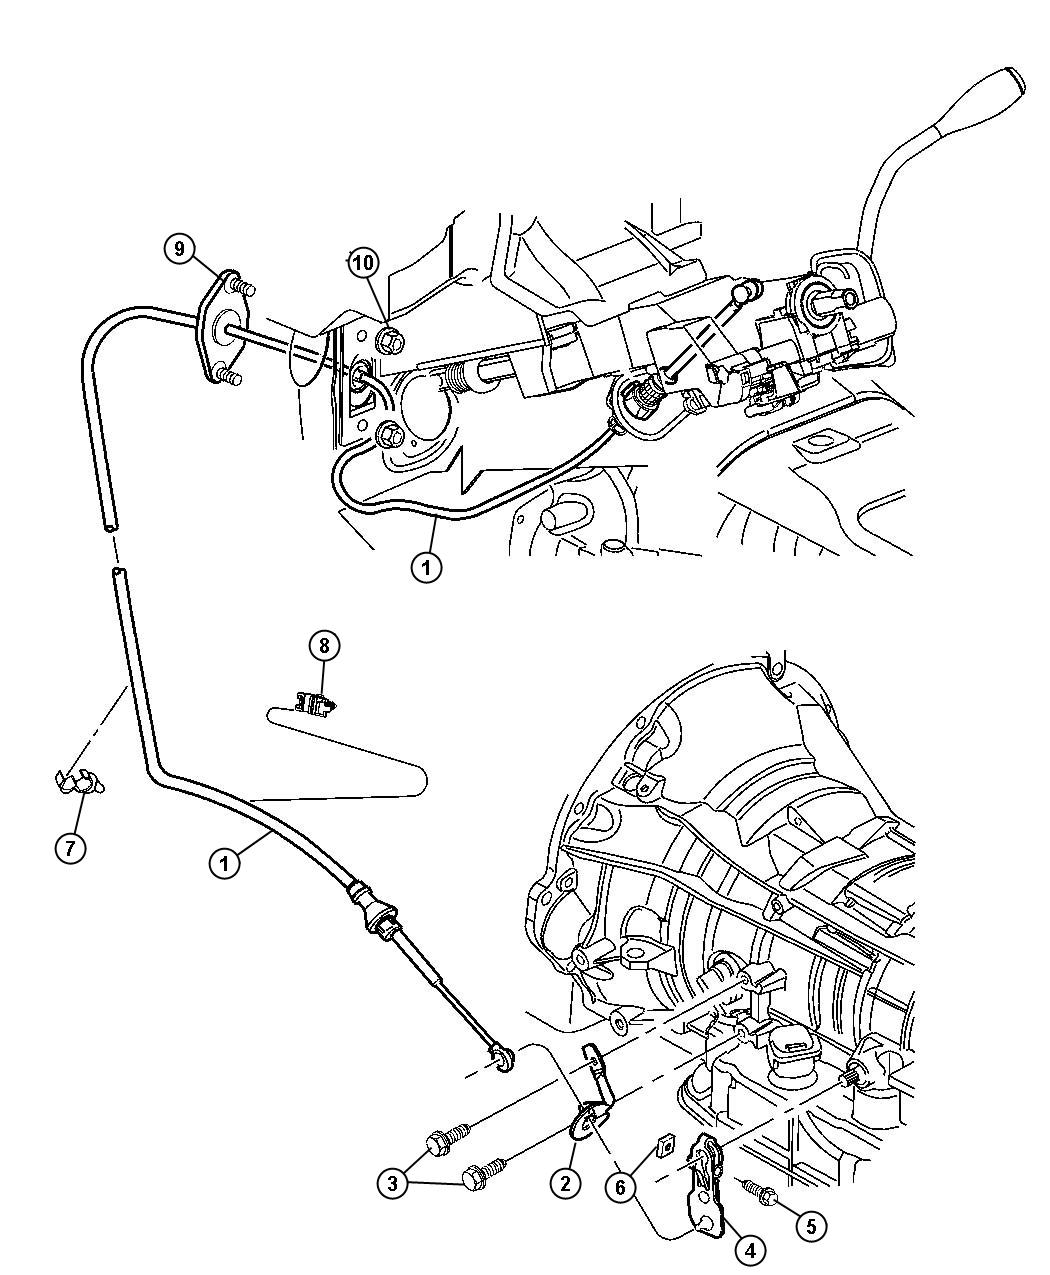 Gearshift Controls 45rfe Transmission 5 Spd Automatic 5